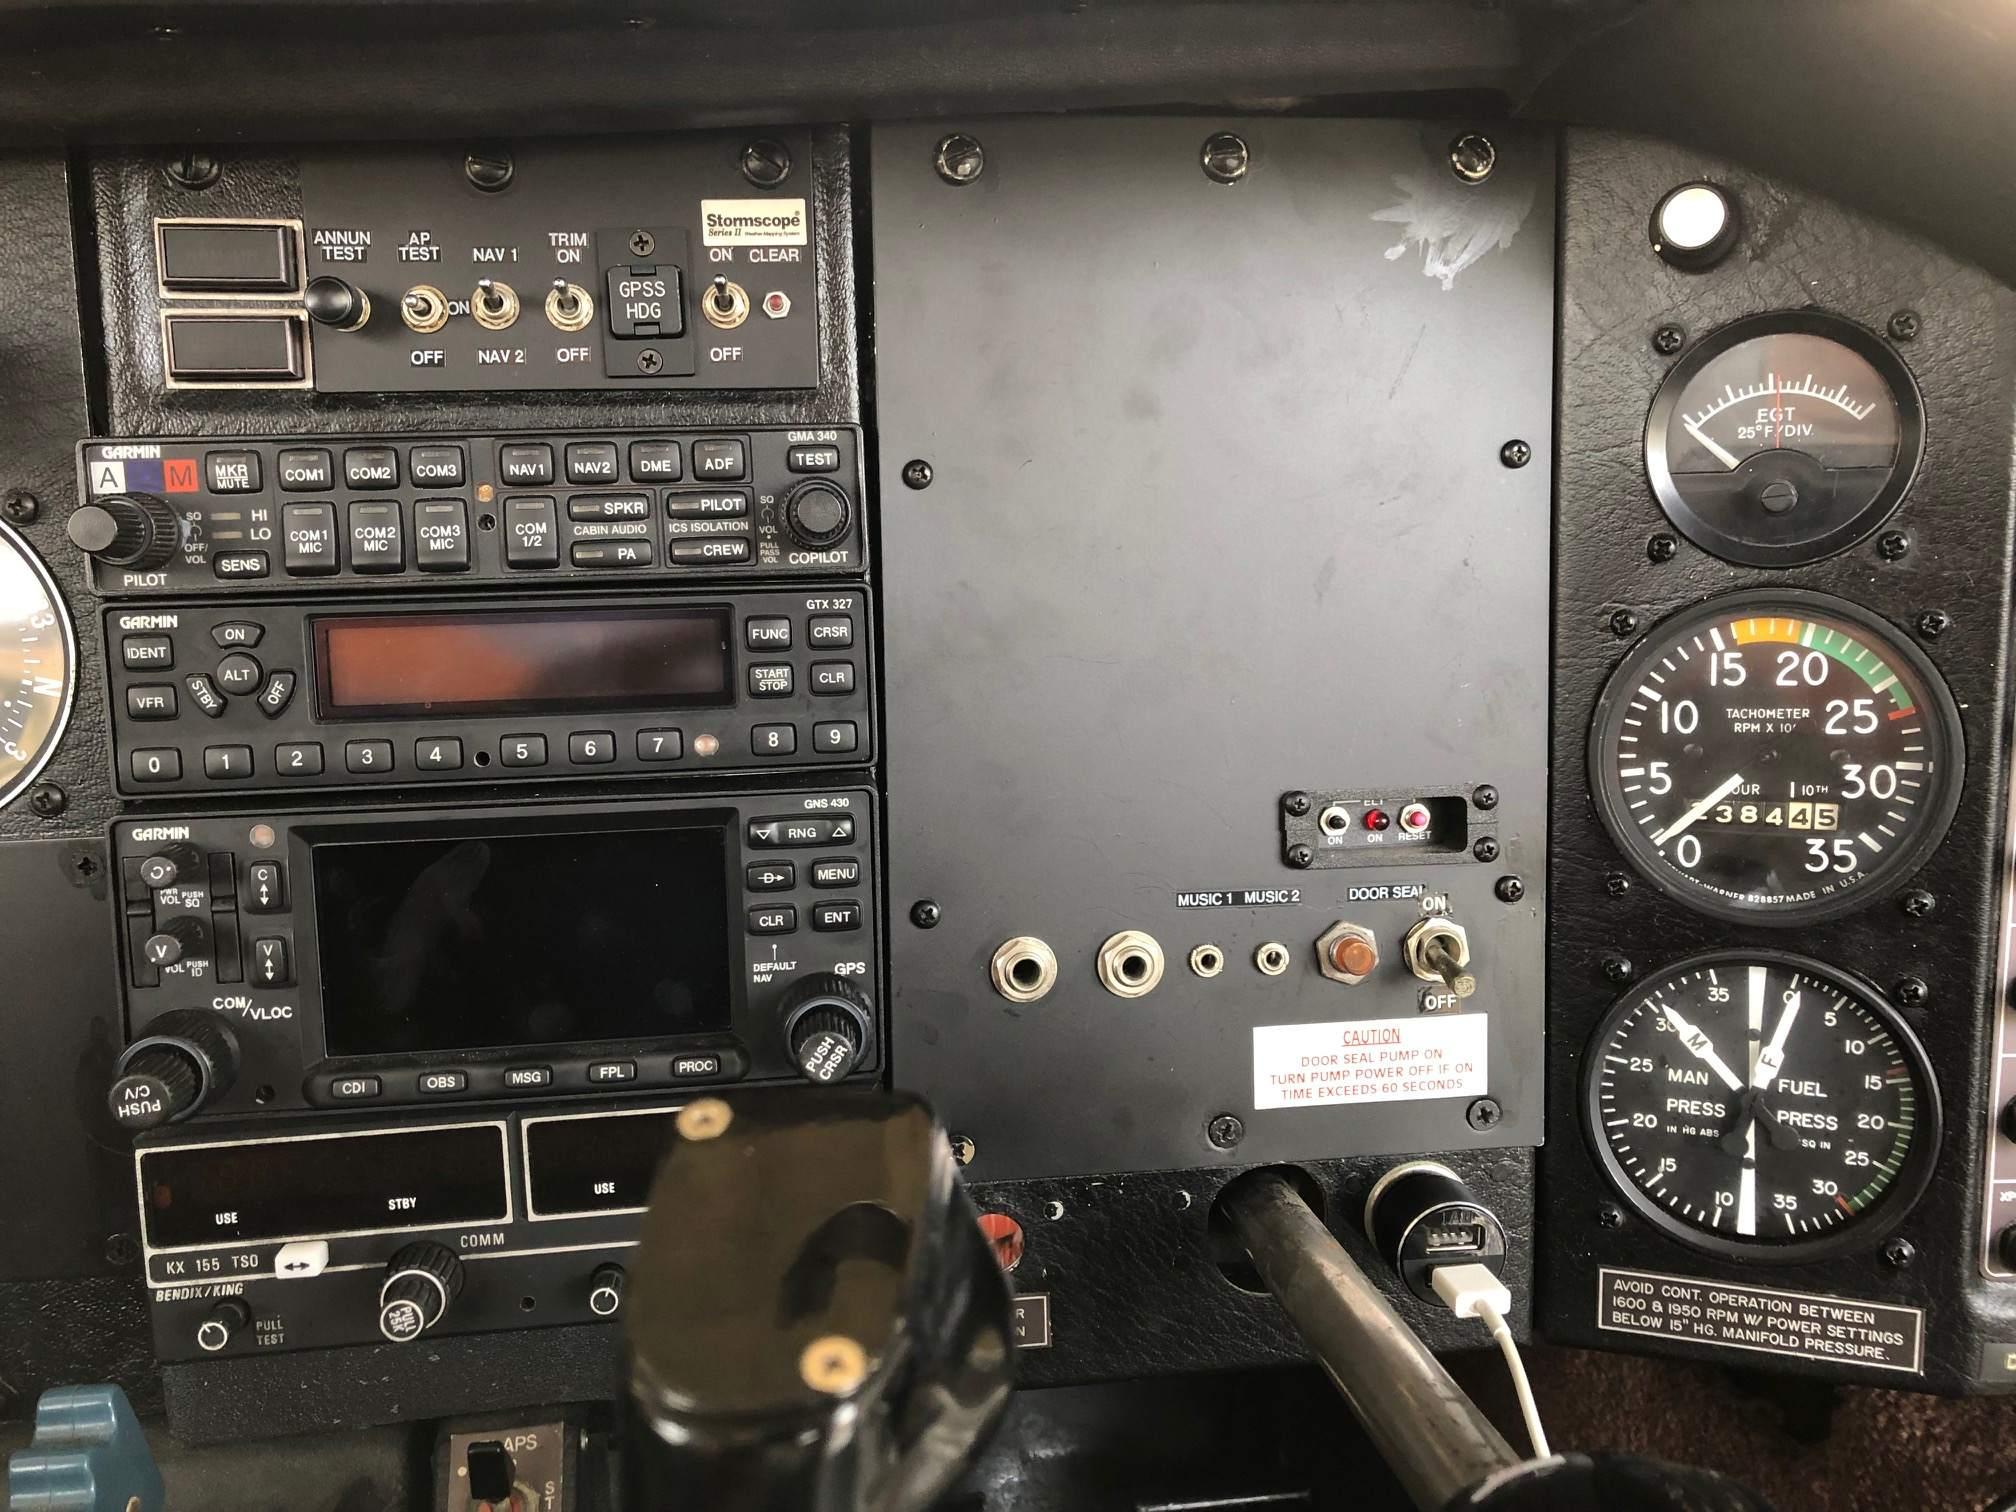 Panel Advice Requested - Avionics/Panel Discussion - Mooneyspace com